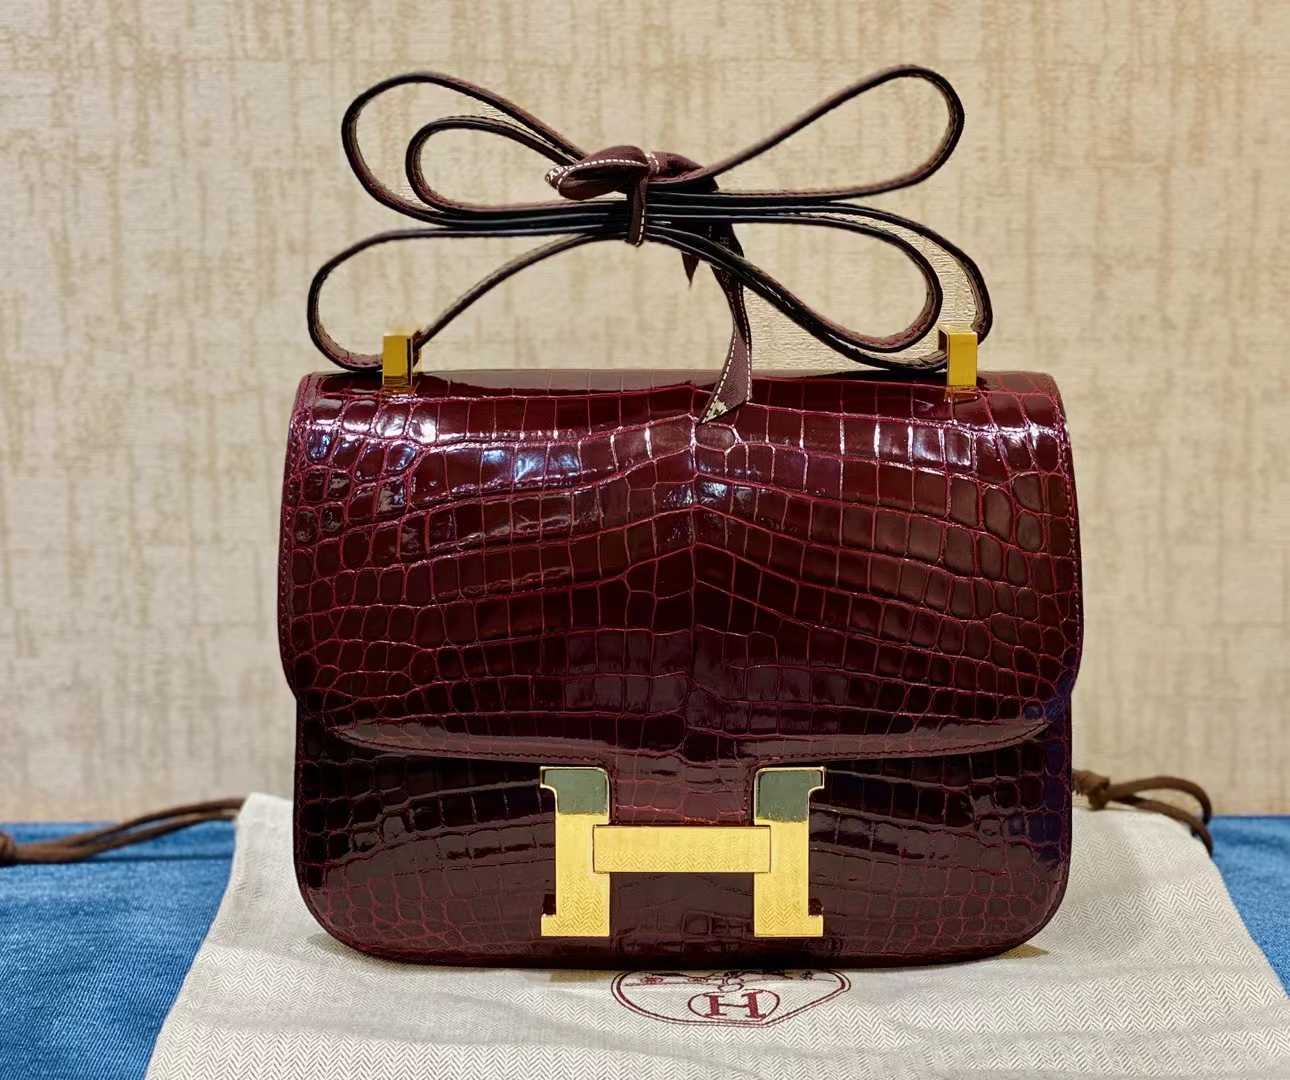 Hermès(爱马仕)Constance 康斯坦斯 鳄鱼皮 波尔多酒红 金扣 24cm 顶级纯手工